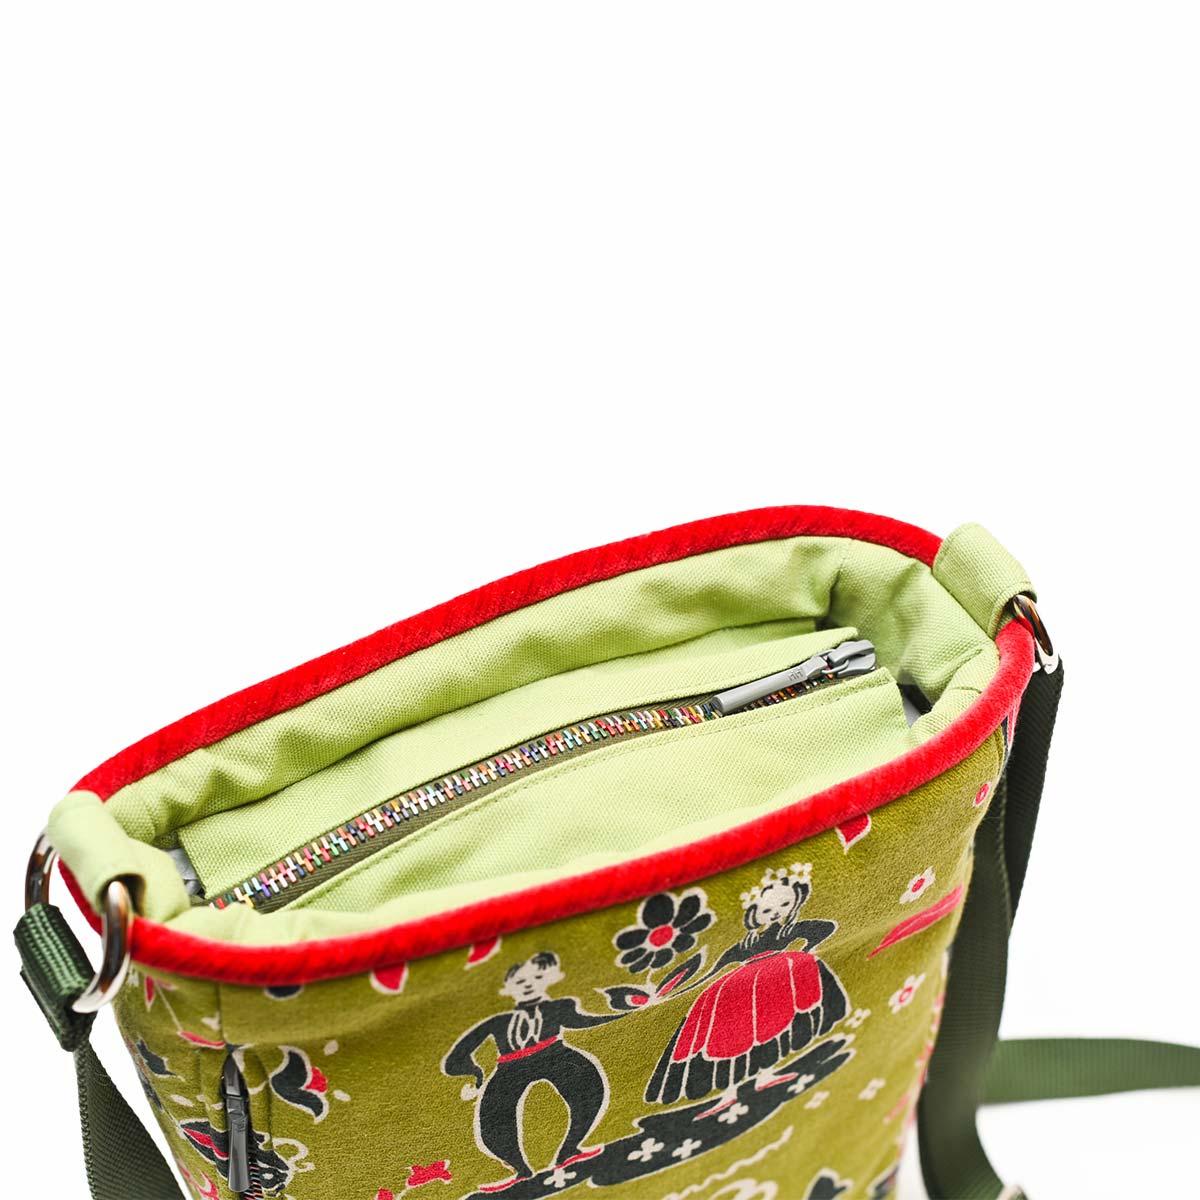 crossbody bag folk motif on avocado DSC 6579